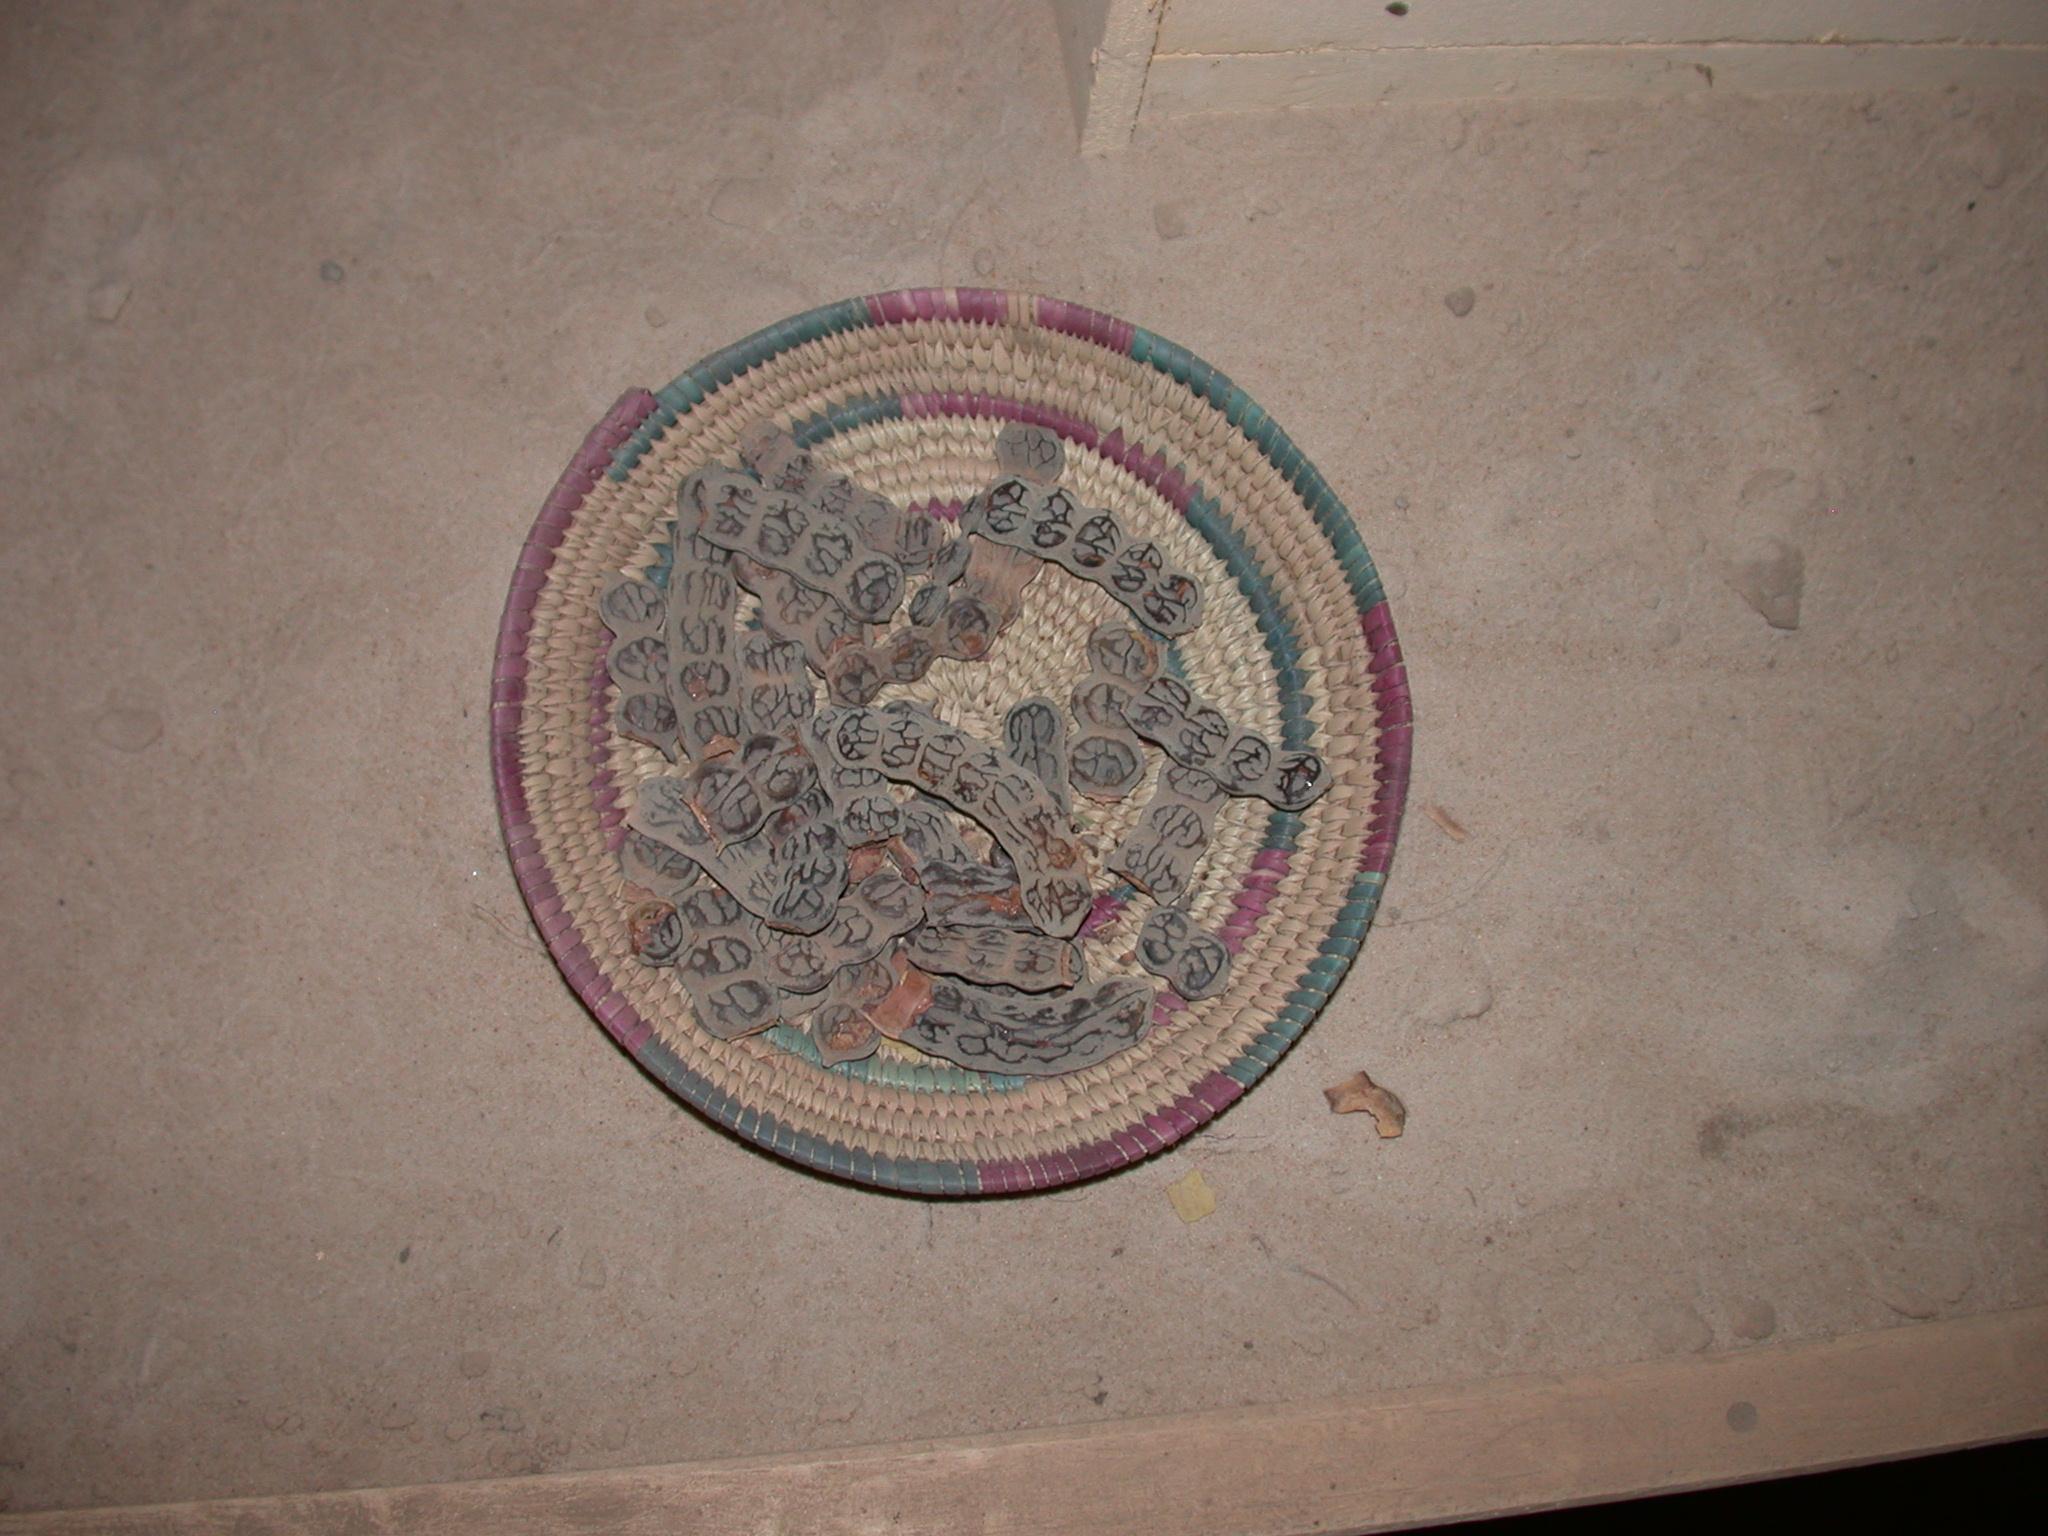 Doum or Fakoye Tanin or Gum Arabic, Timbuktu Ethnological Museum, Timbuktu, Mali